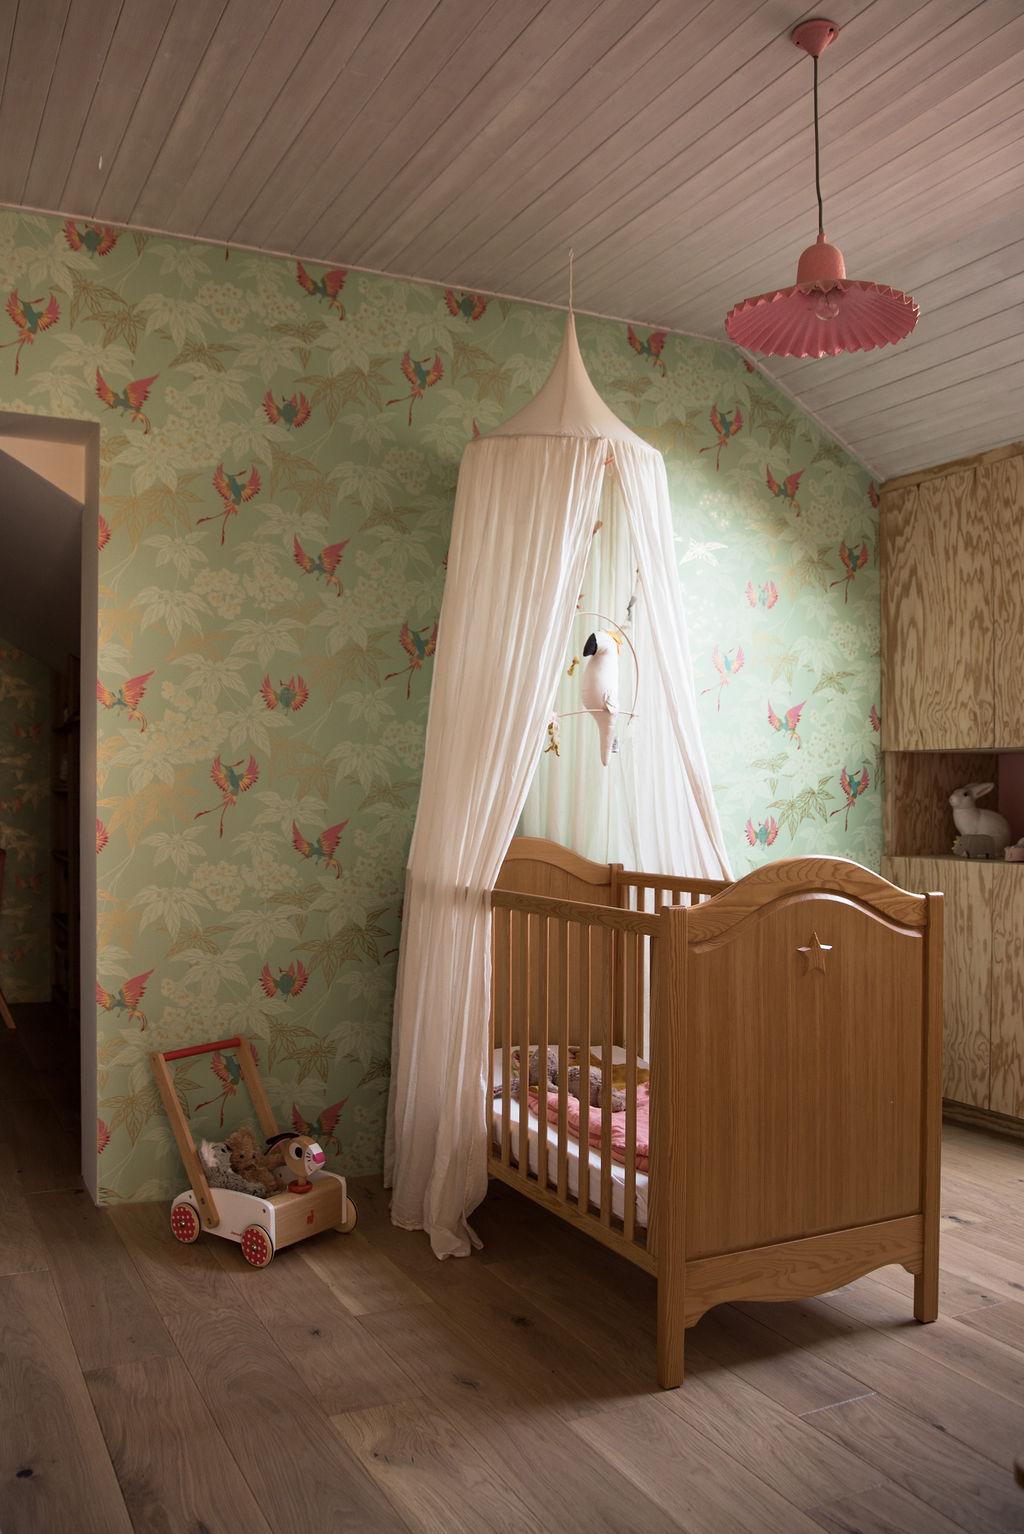 Lit Cabane Maman Louve la chambre de ninon, 24 mois - sunday grenadine